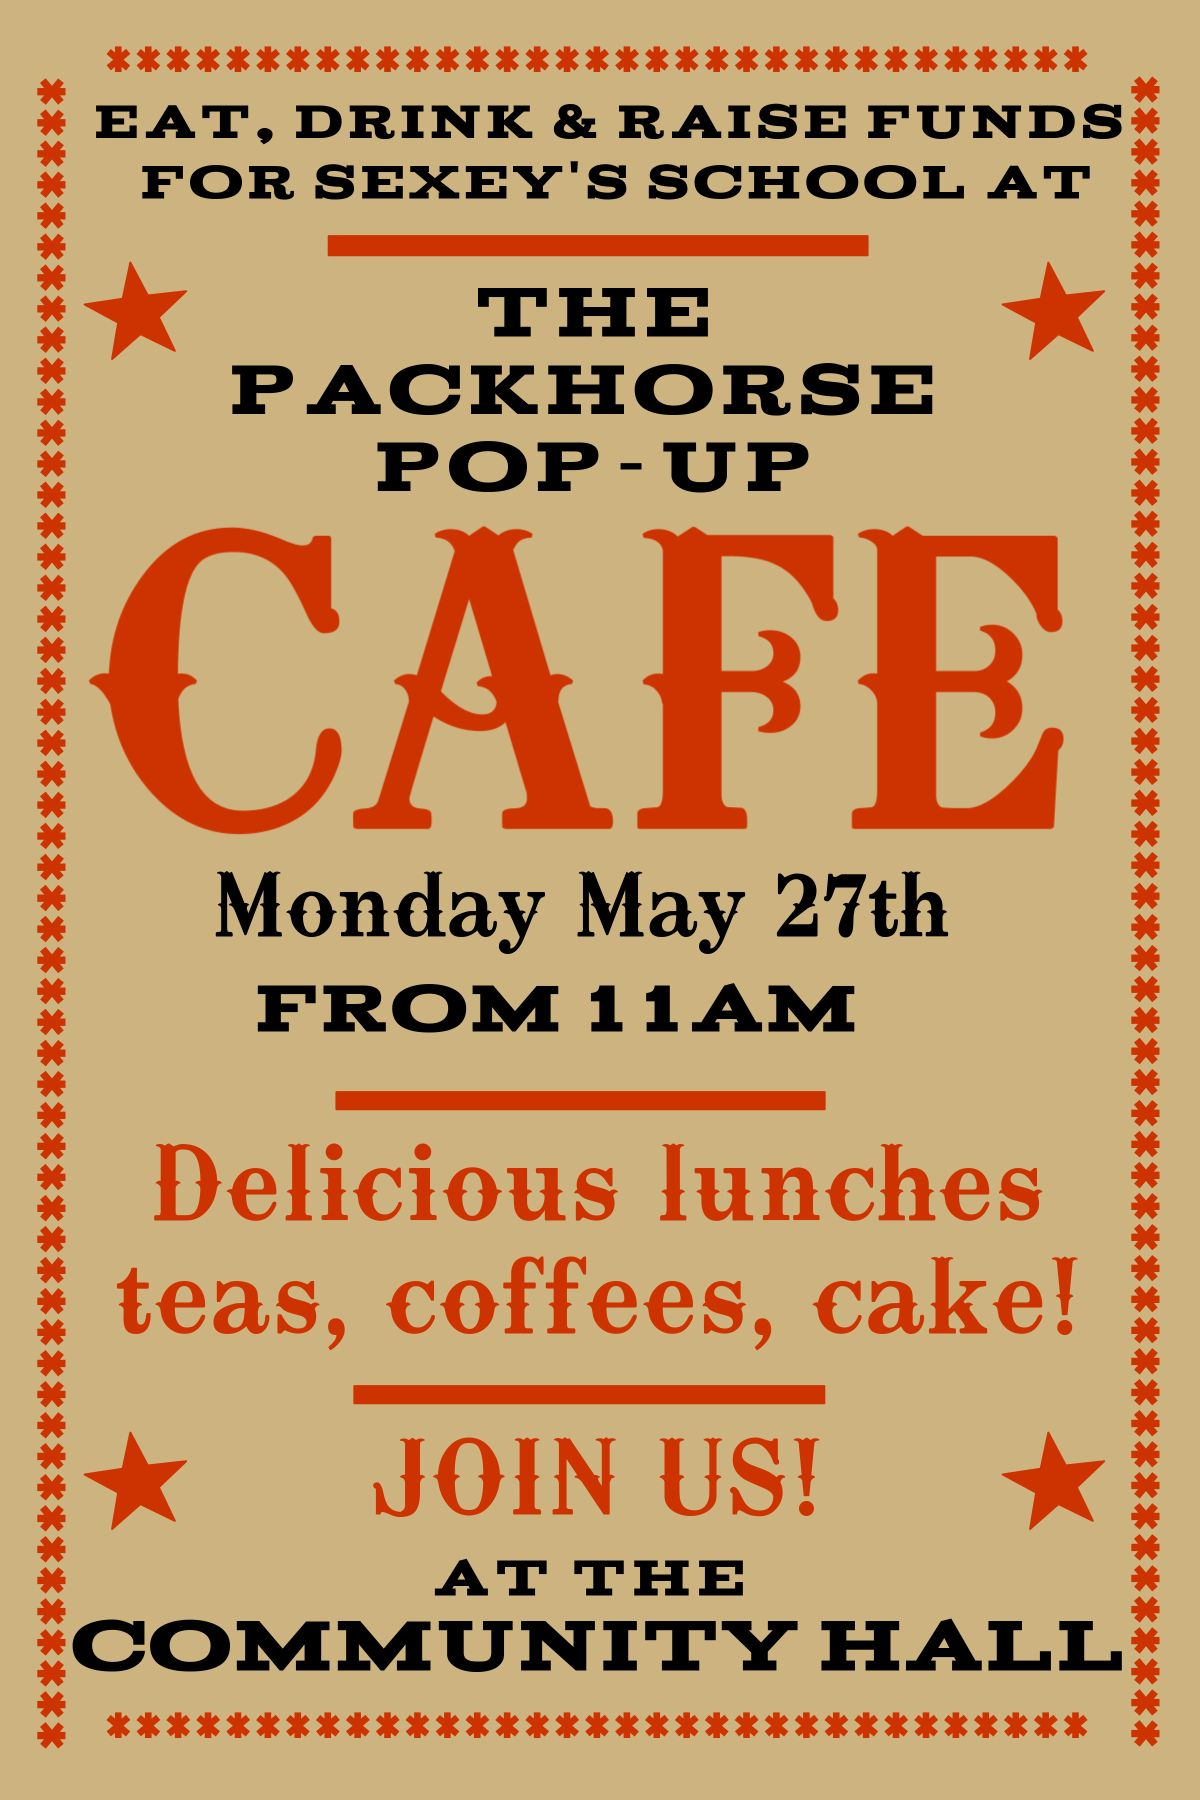 The Packhorse Pop-up Cafe